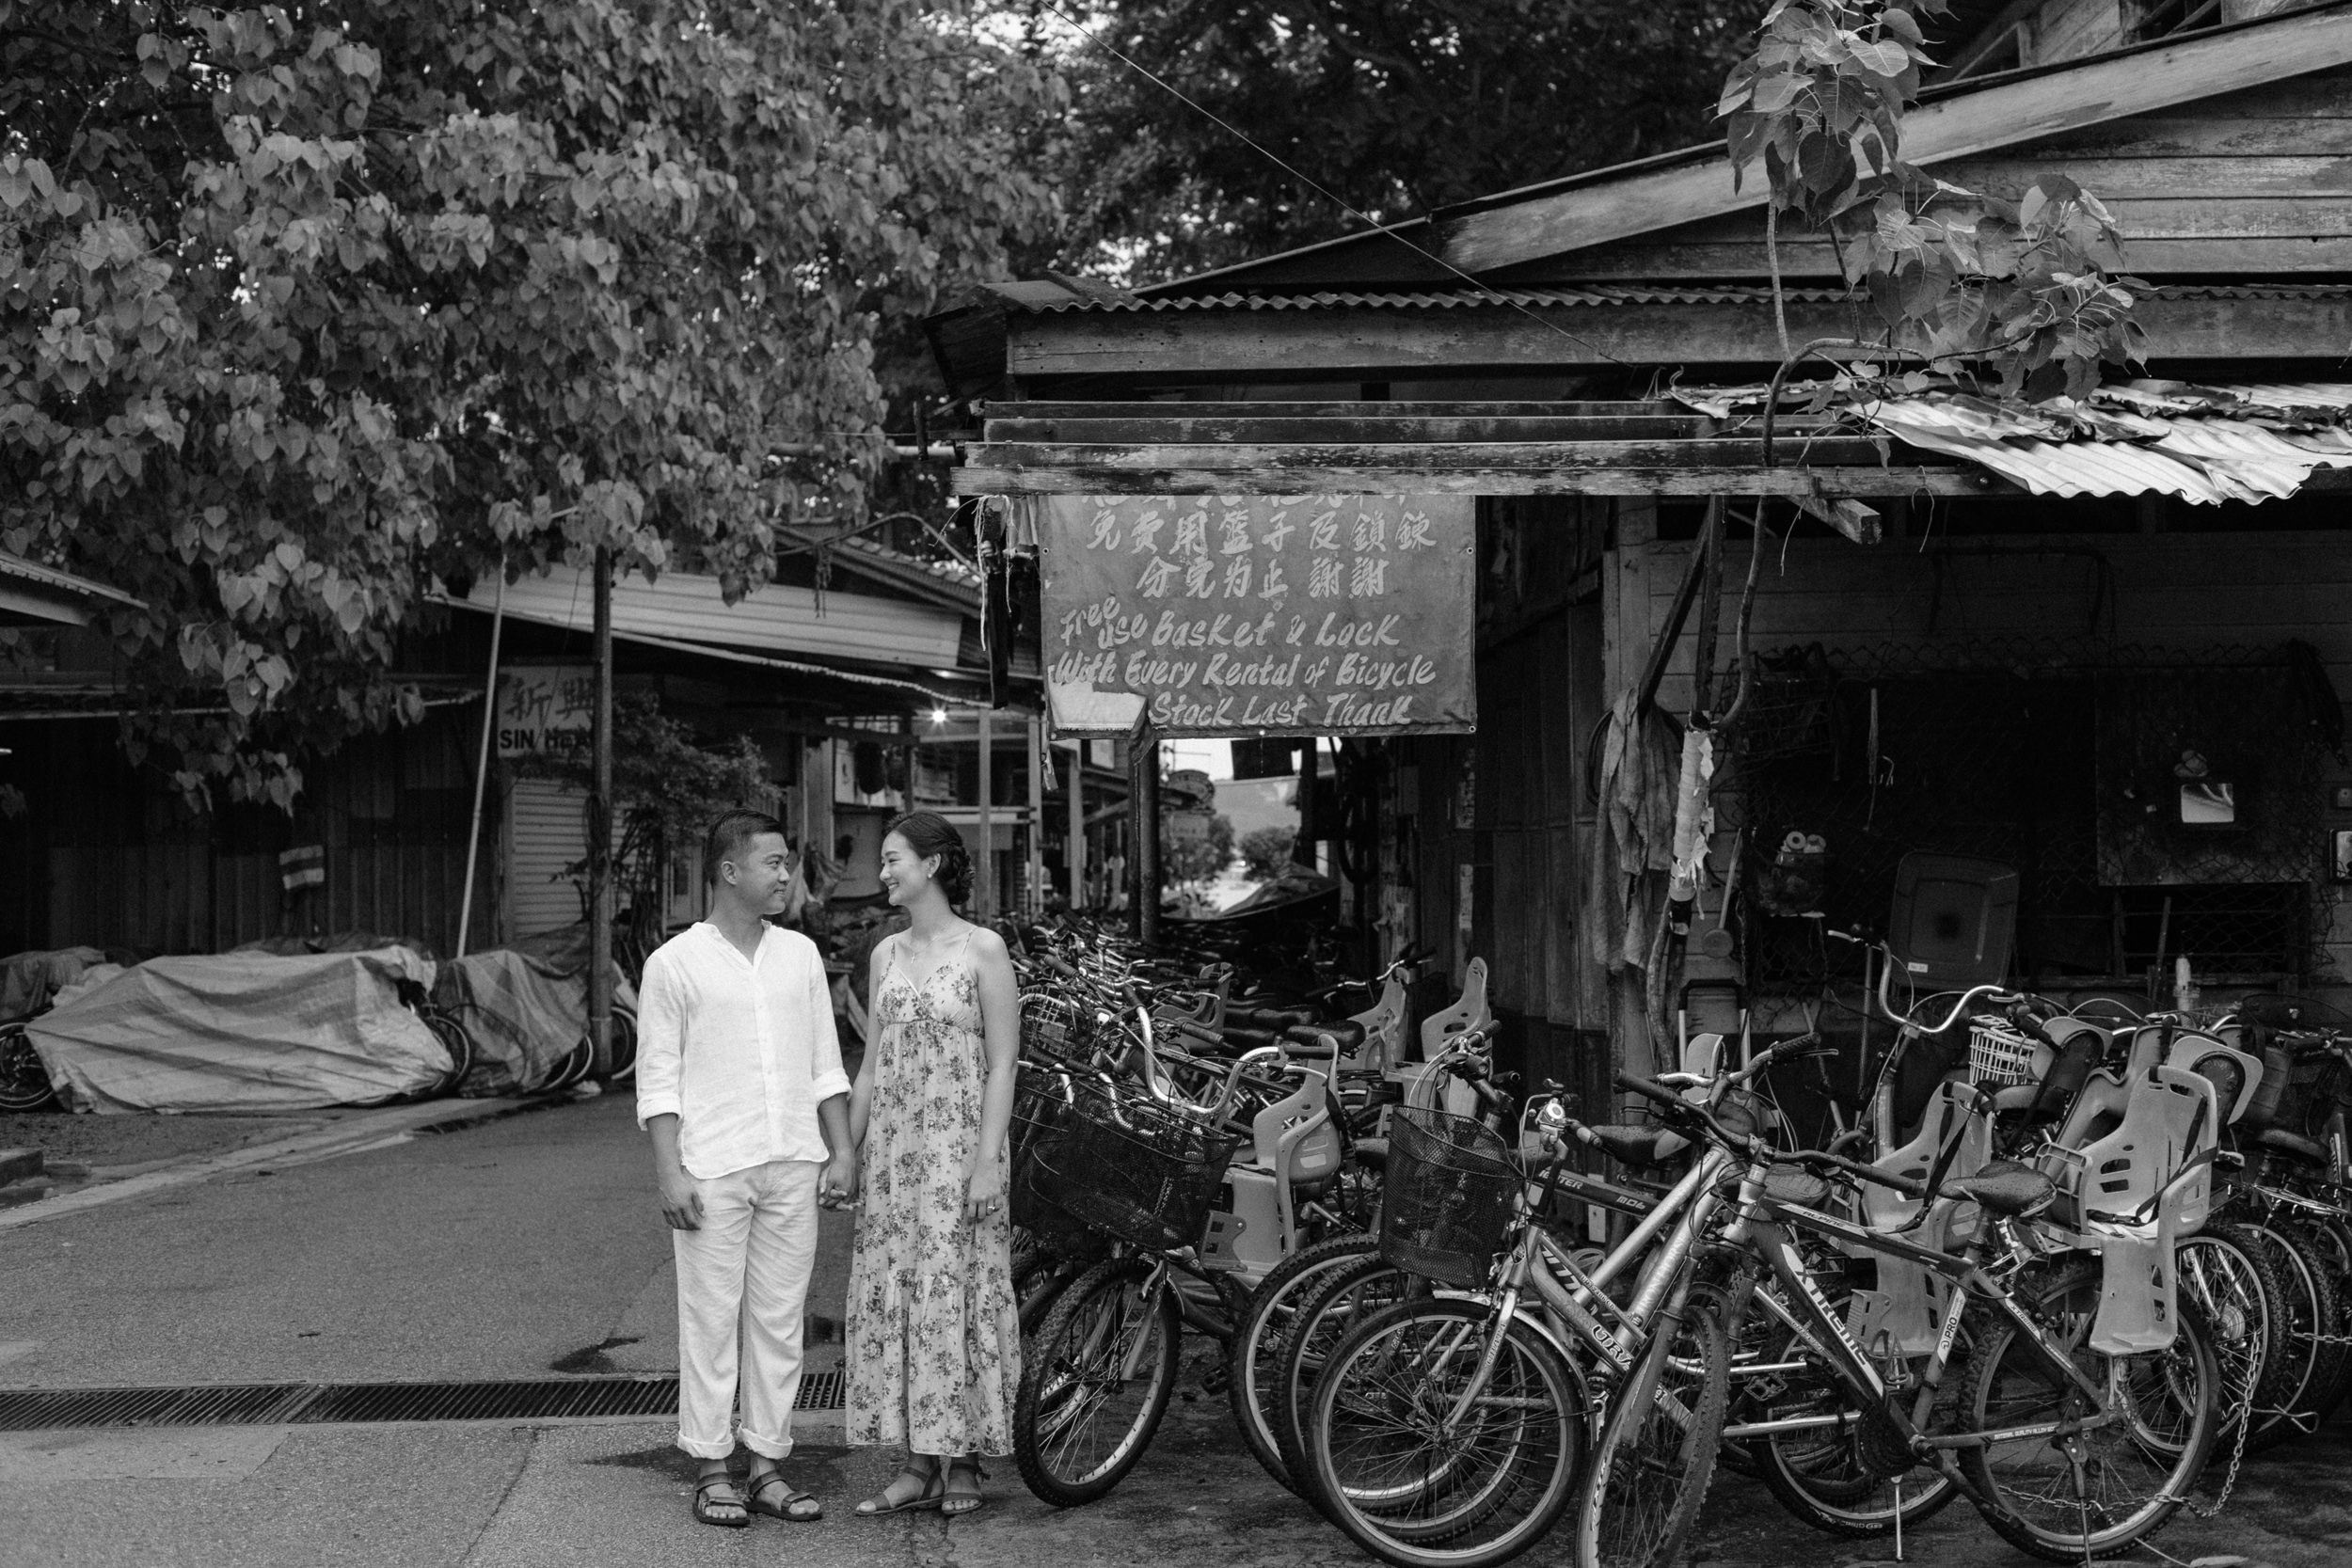 singapore-wedding-photographer-wemadethese-junekit-kingslin-24.jpg